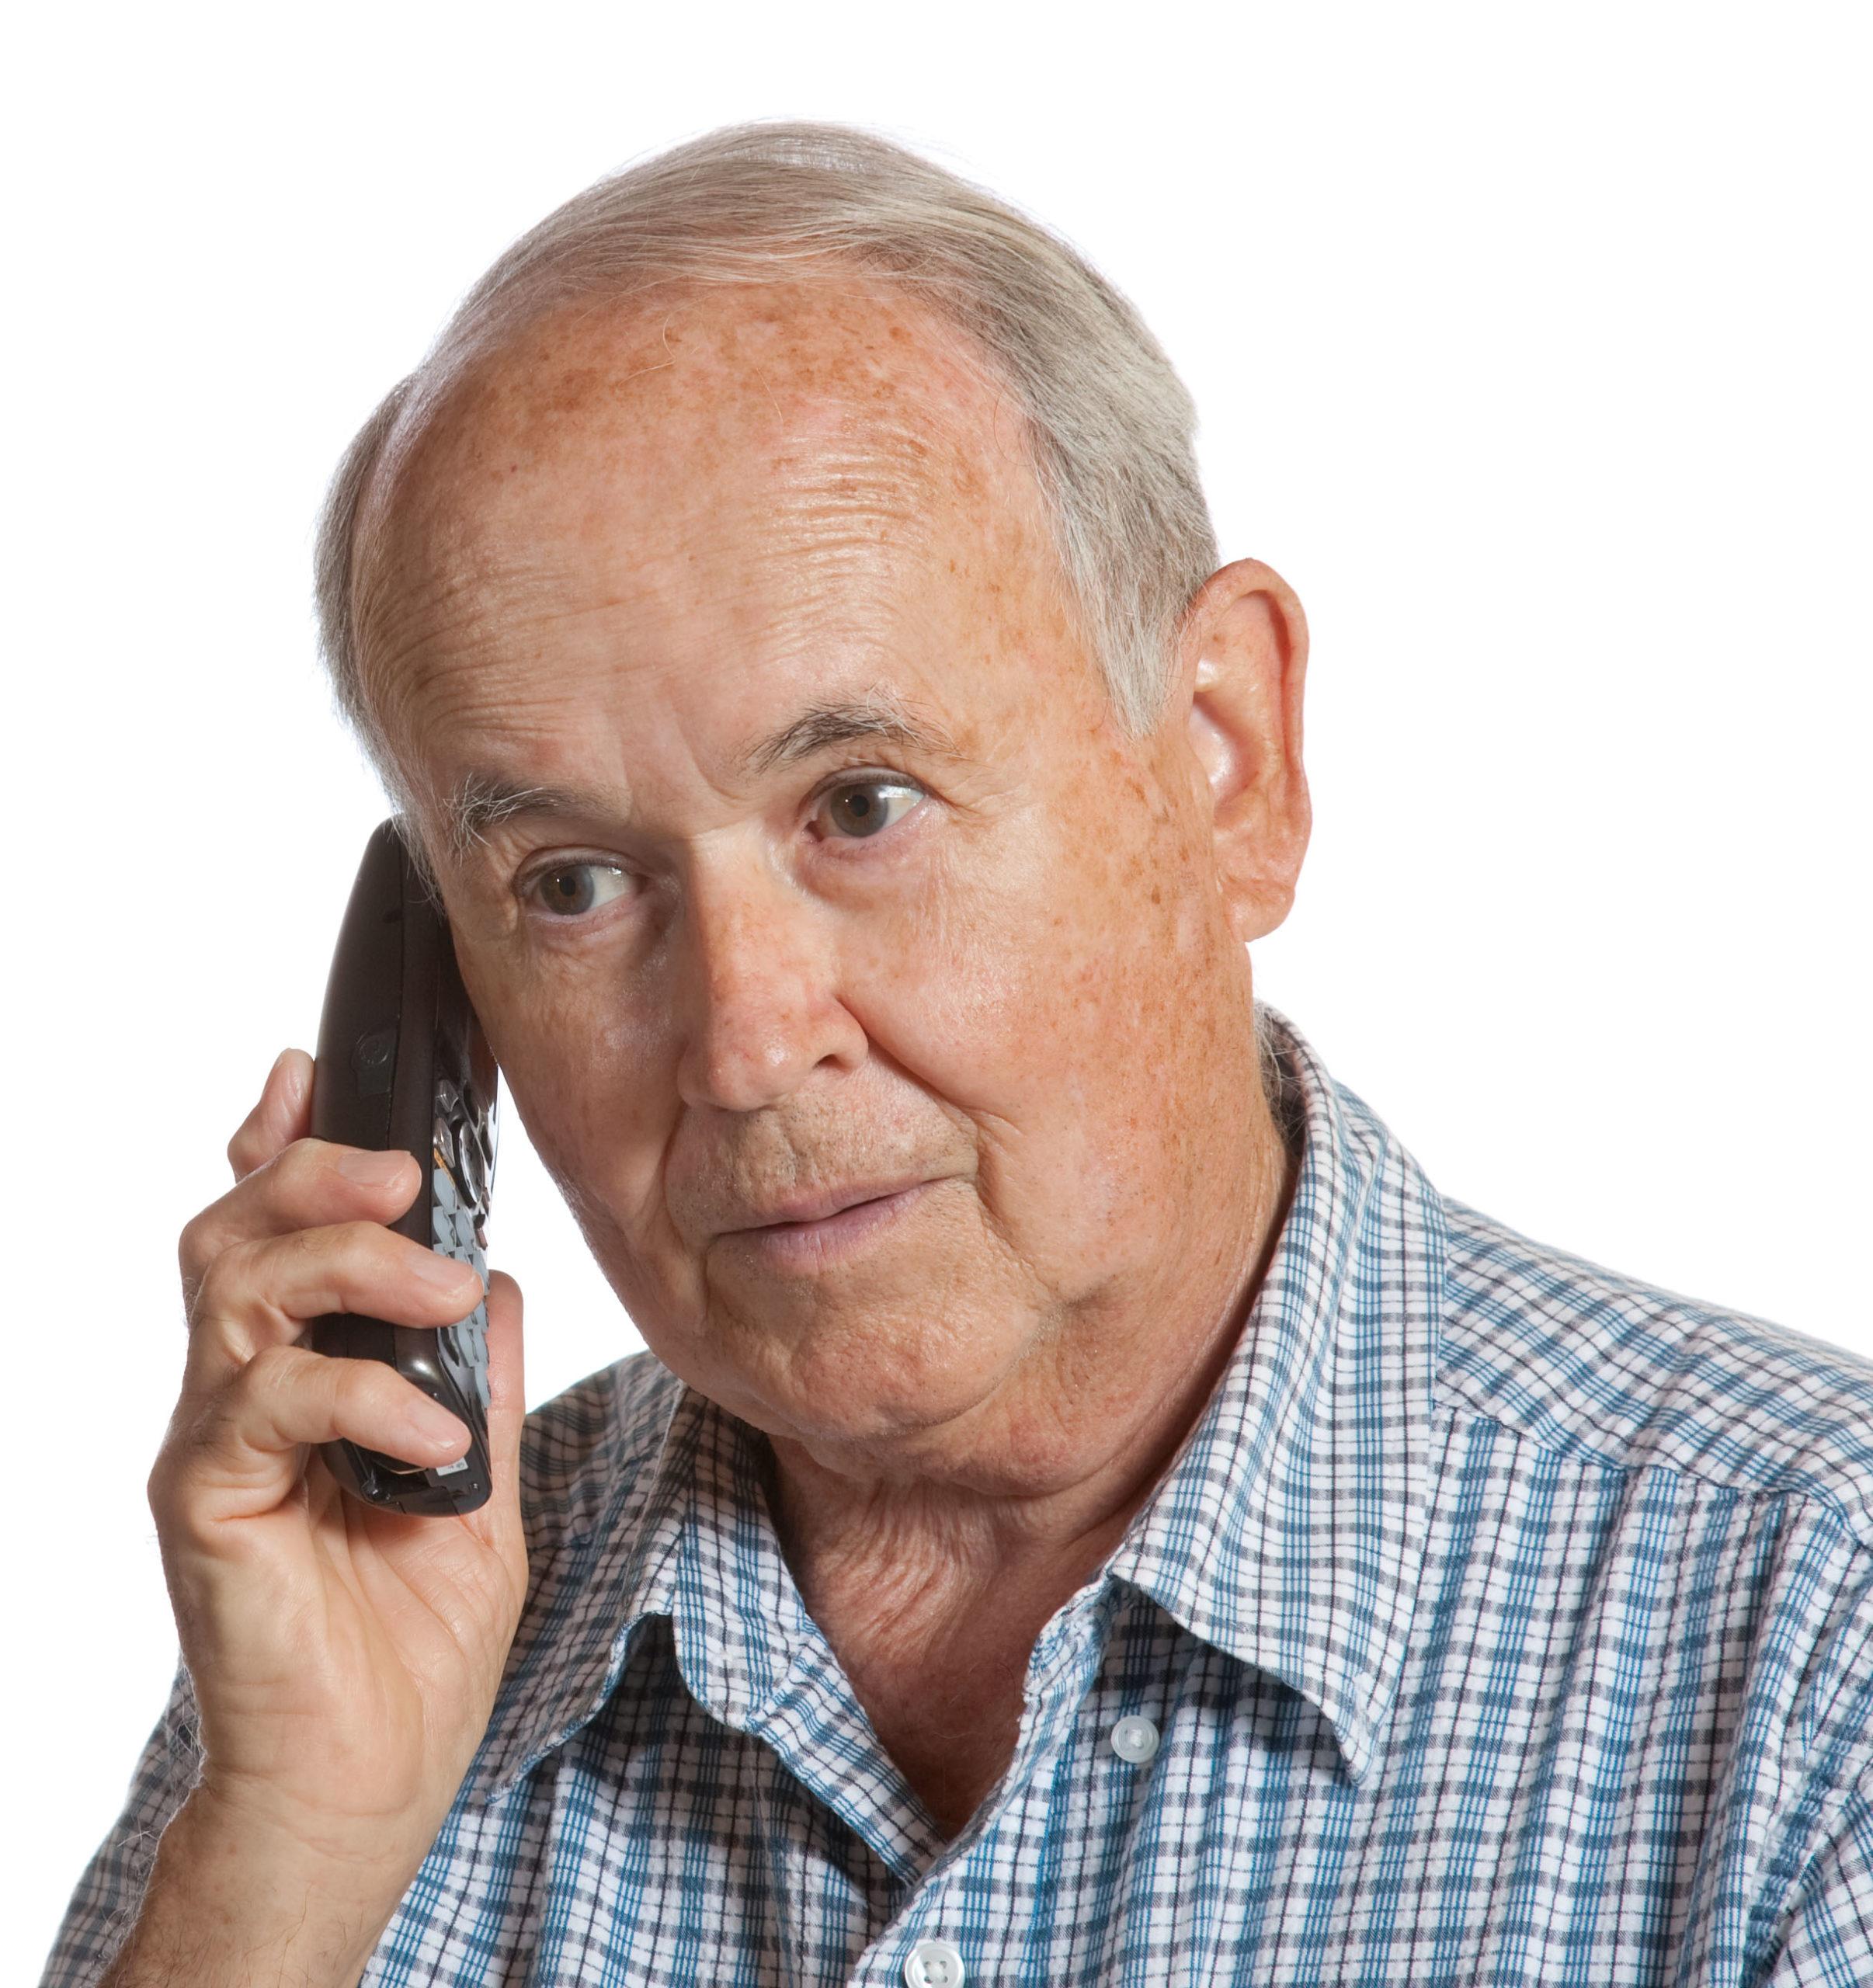 Elderly male calling the Helpline 01392 876 666